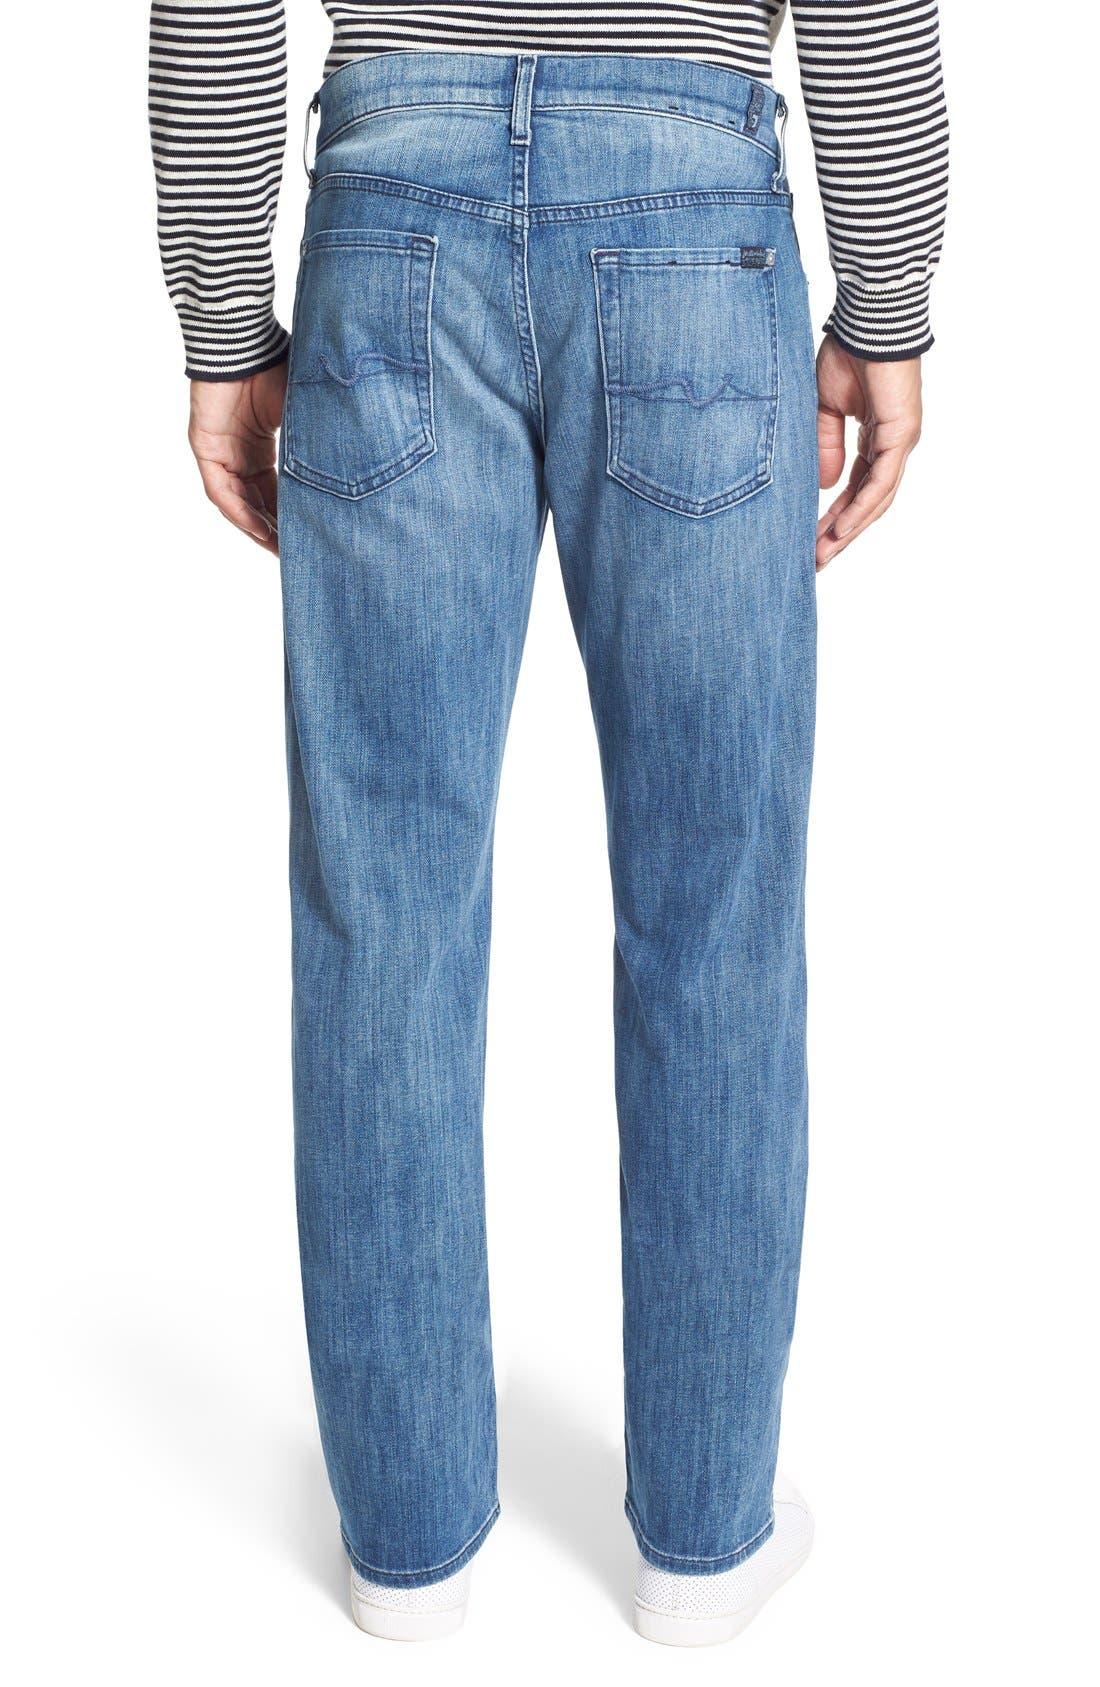 Luxe Performance - Austyn Relaxed Straight Leg Jeans,                             Alternate thumbnail 2, color,                             NAKKITTA BLUE